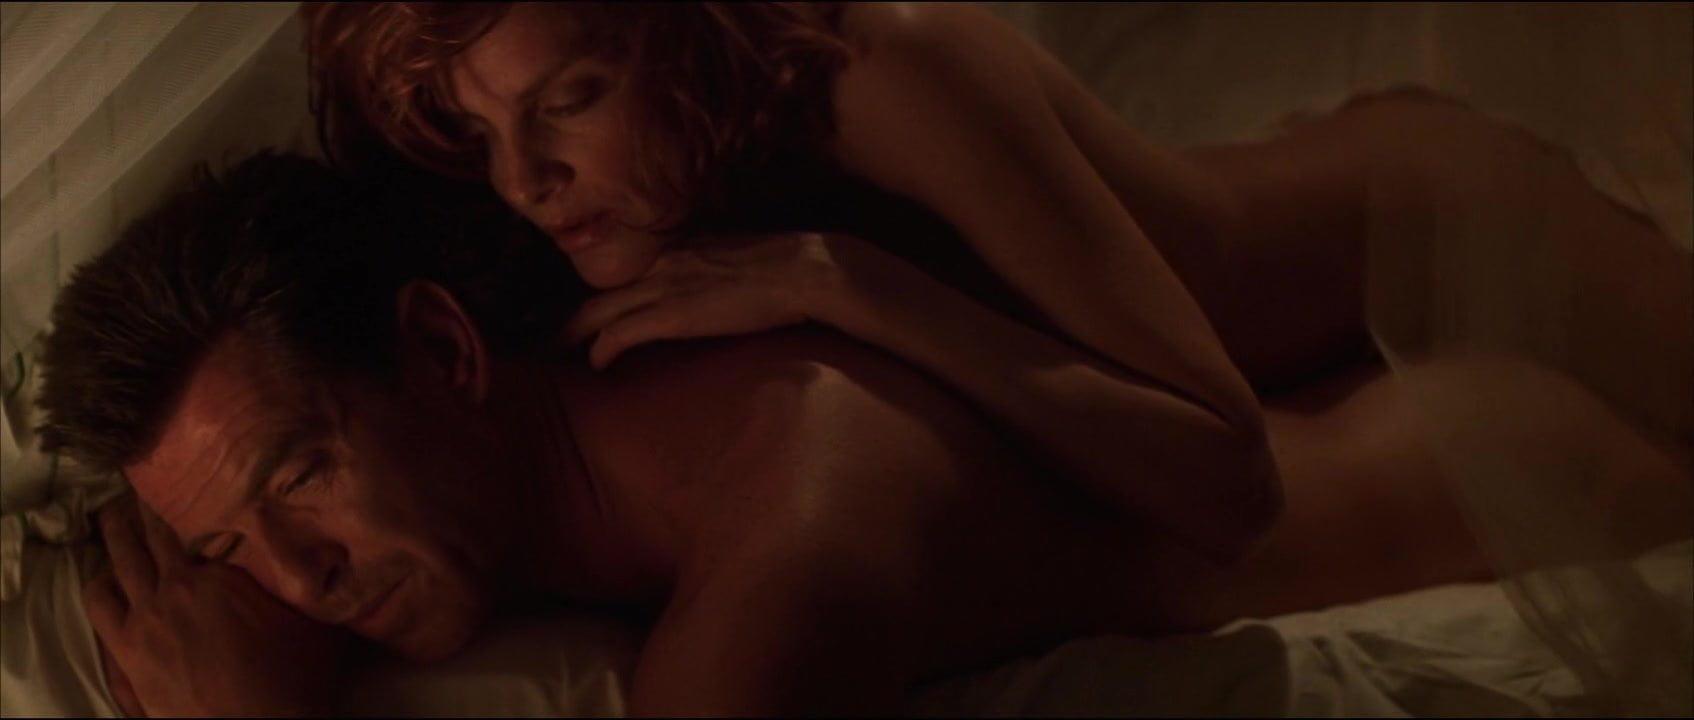 Renee Richards Porn, Sex Pics, Fuck Clips